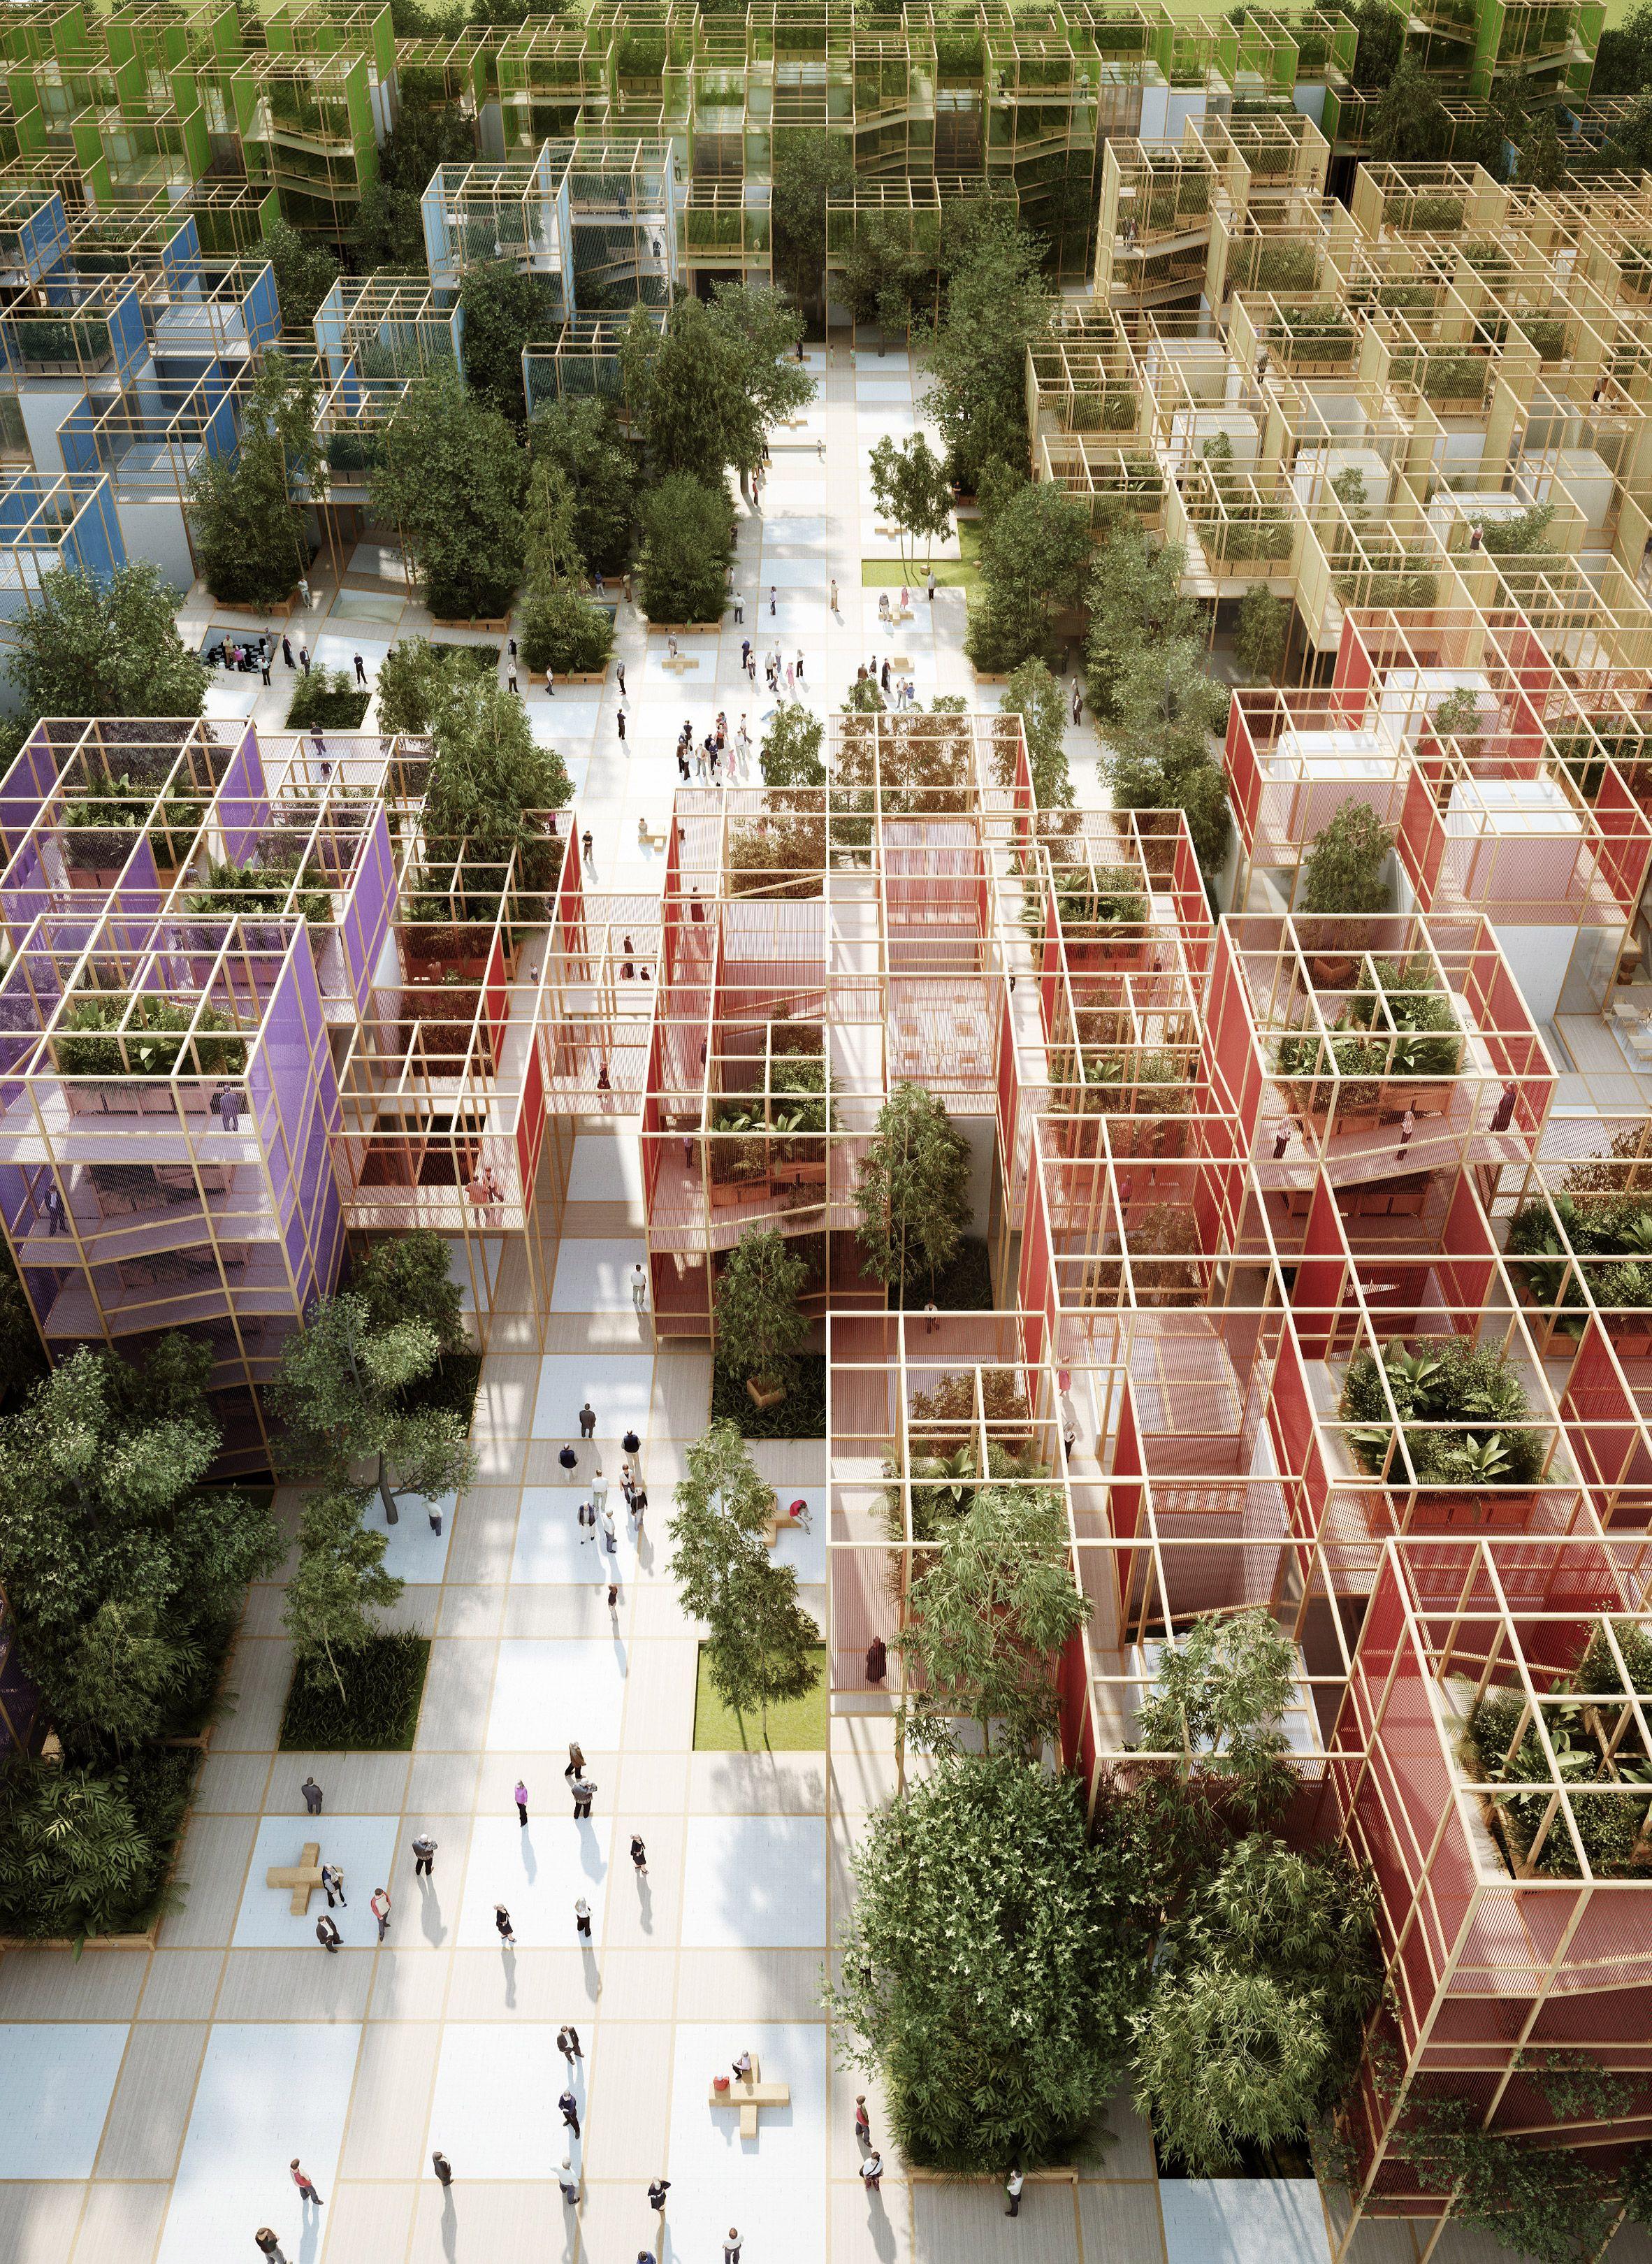 Architecture studio Penda has revealed plans to create a vast network of modular building blocks at & Architecture studio Penda has revealed plans to create a vast ...